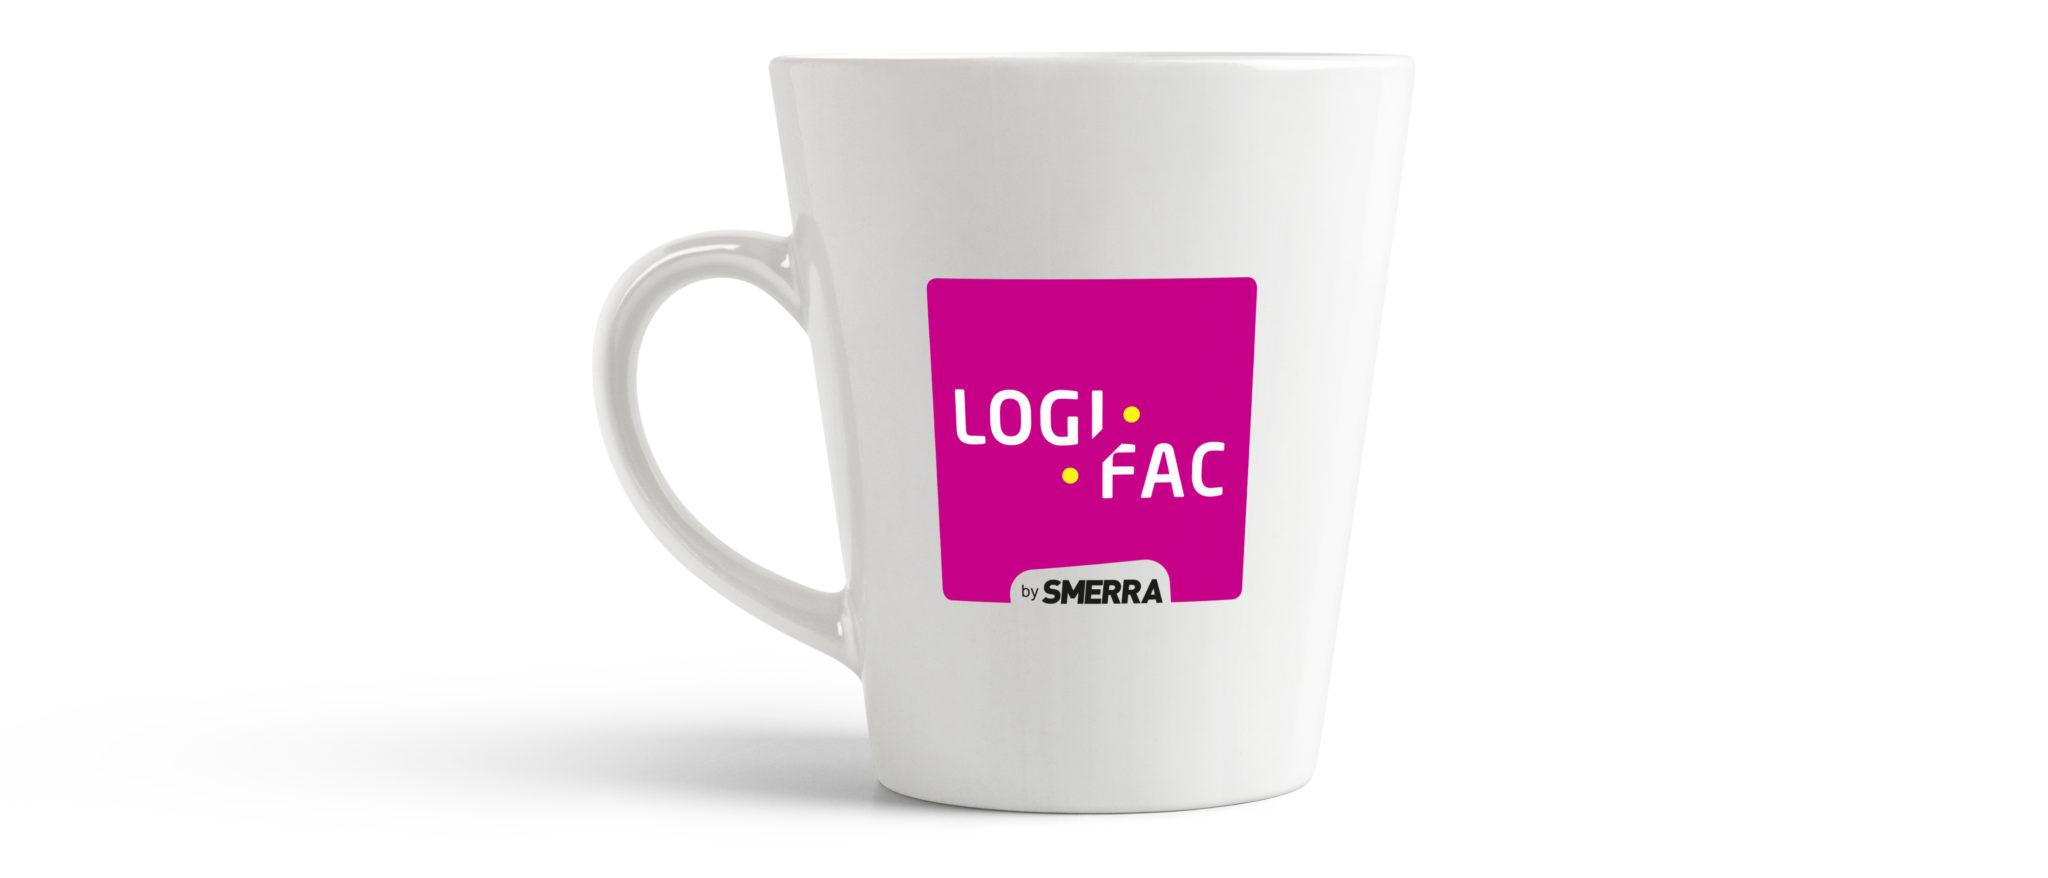 Un brin de campagne, Agence de communication, Lyon, Logifac, Smerra